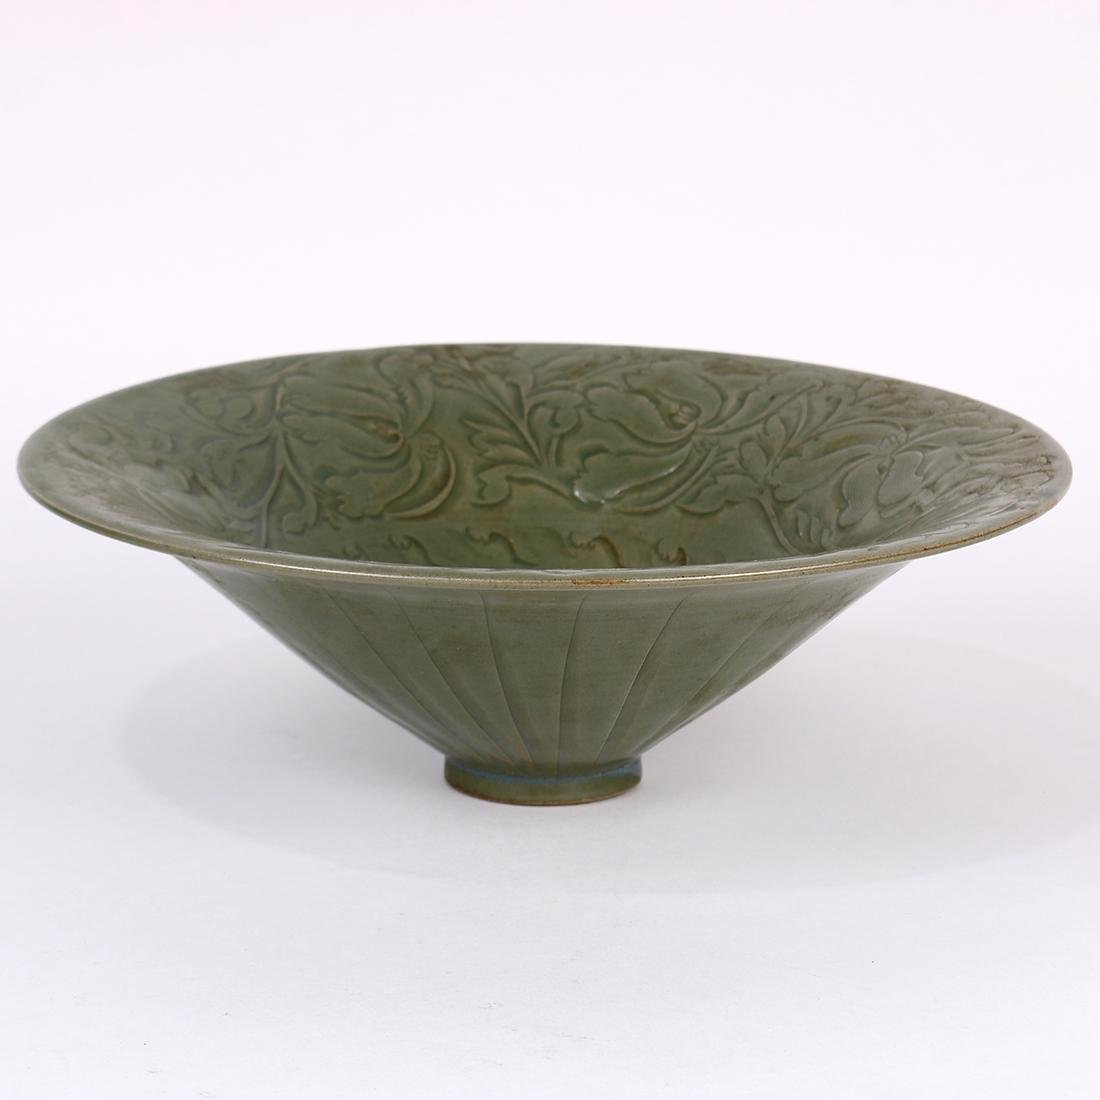 Chinese Yaozhou Type Bowl, Flower